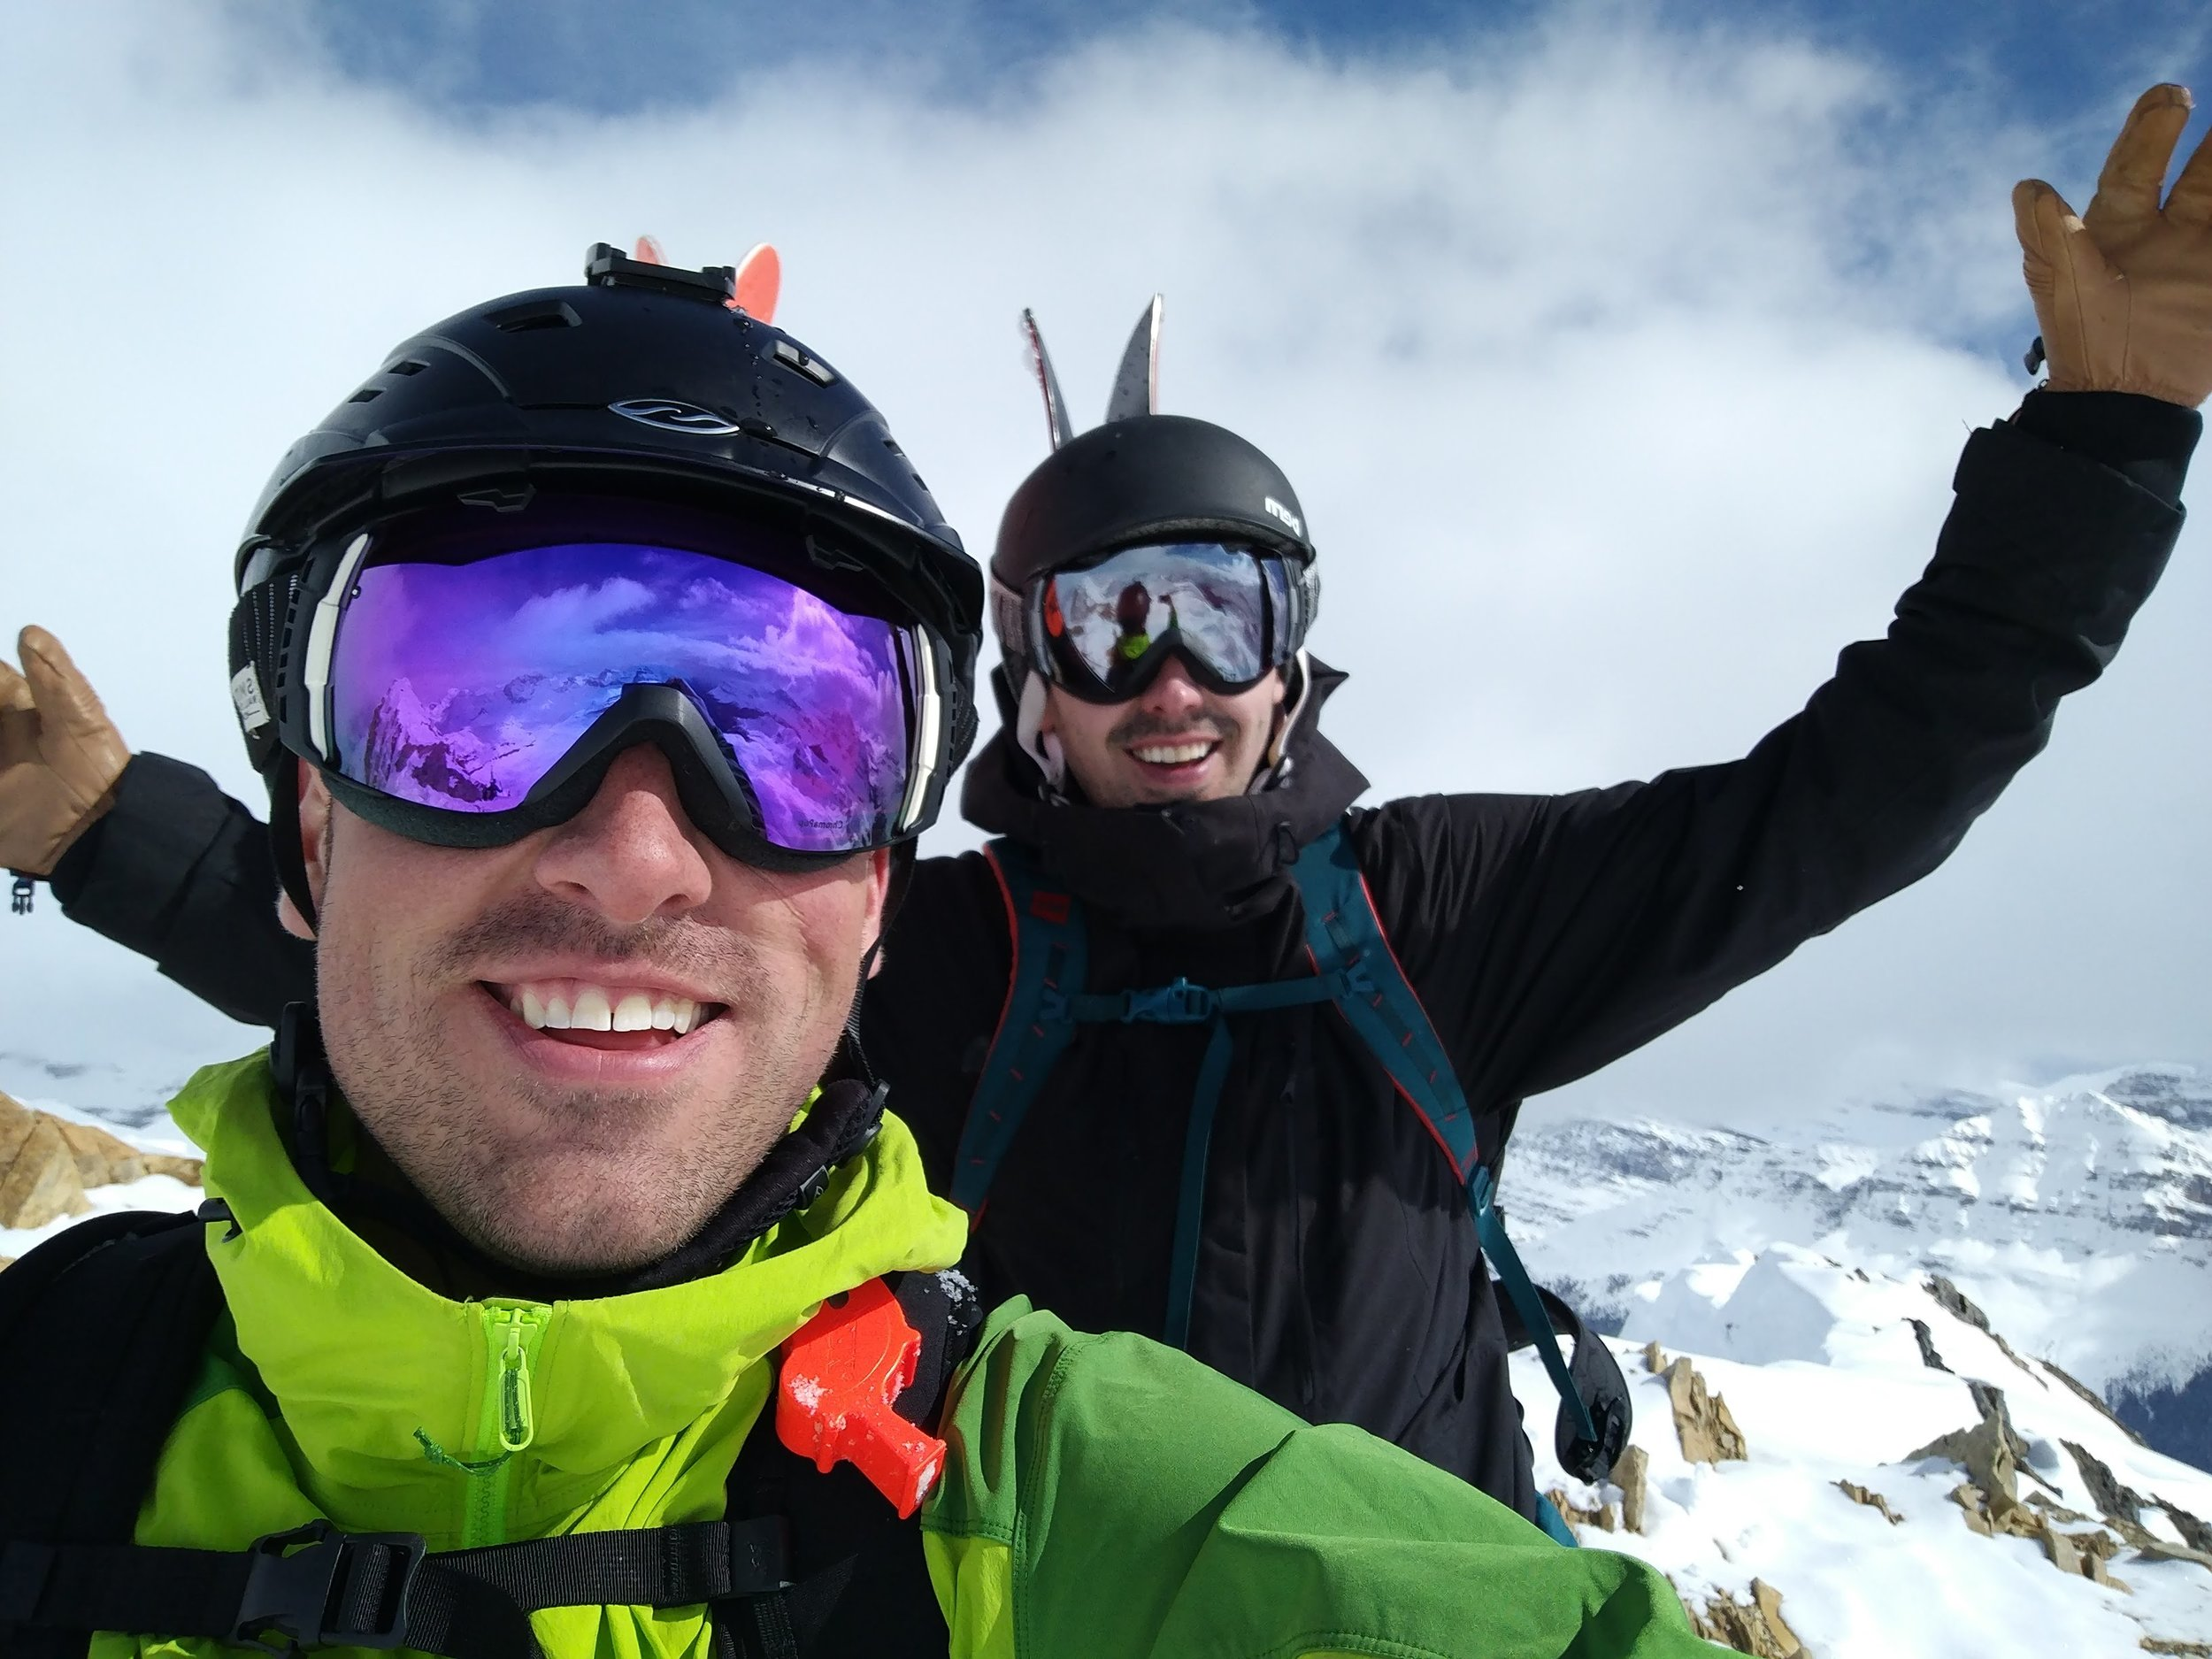 Jake and Jarett on top of the world at Cirque Peak last season on a BRMP trip (formerly WIM+)